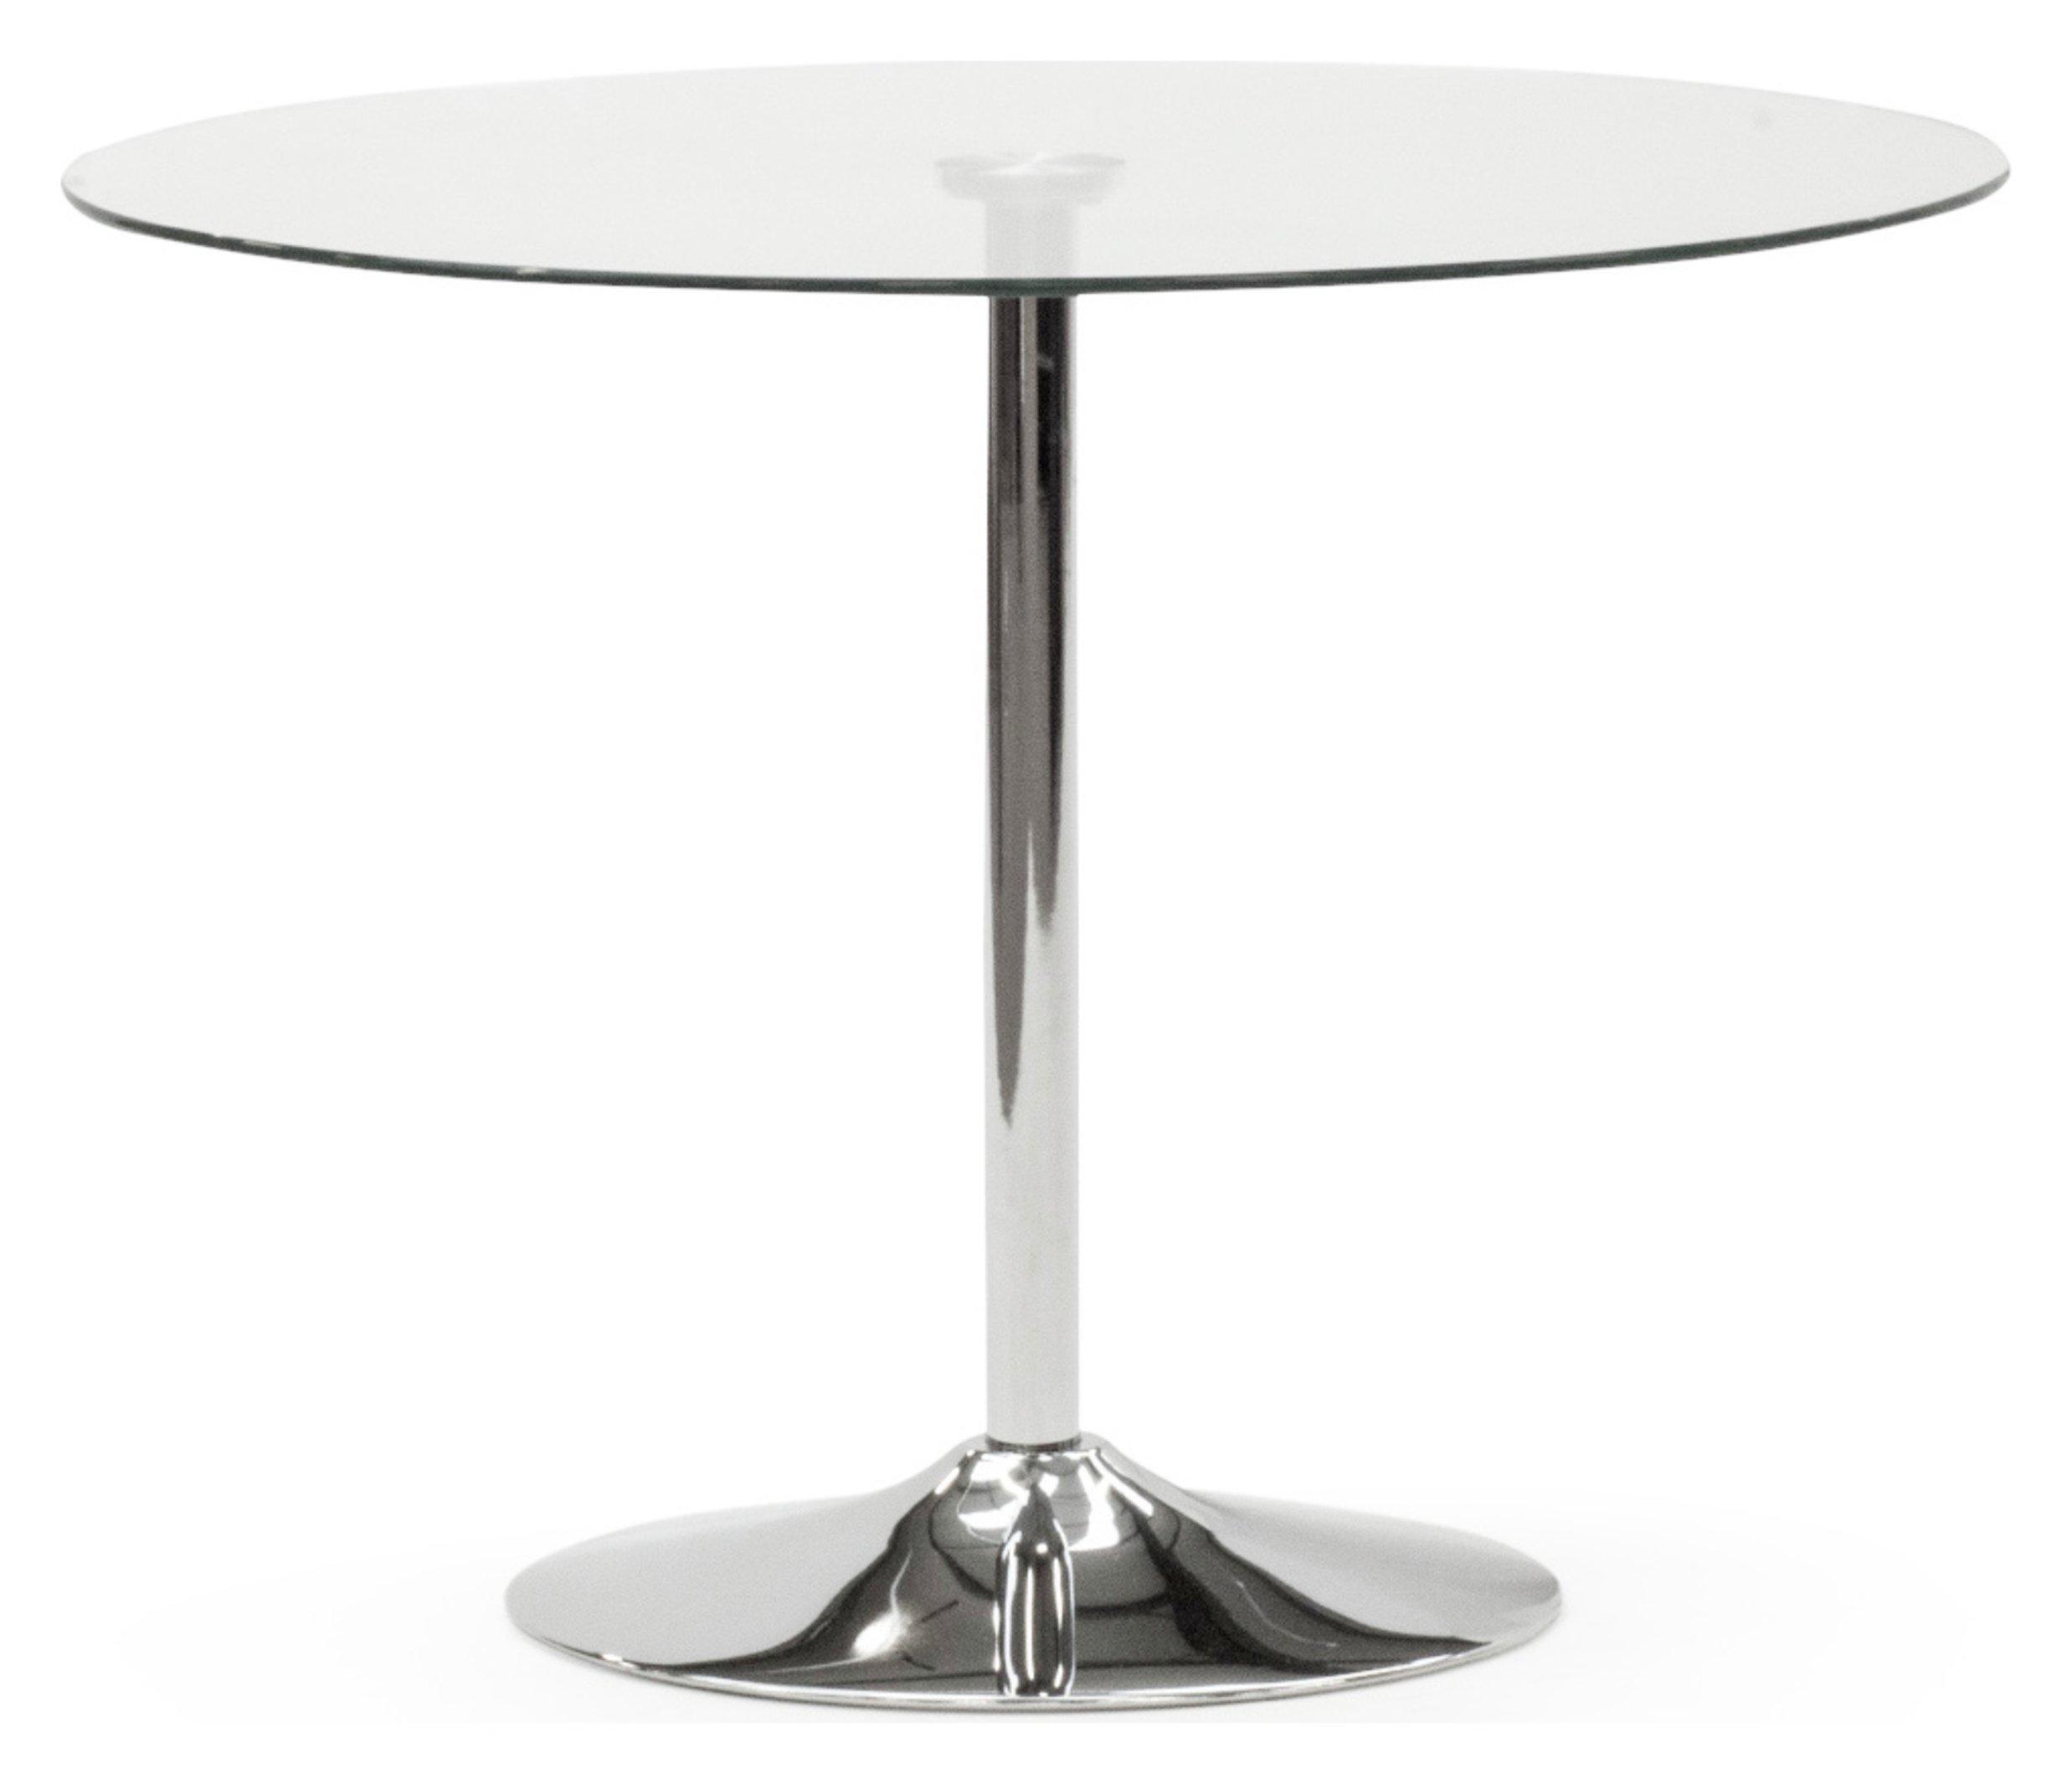 Furnoko Orbit Glass 4 Seater Table - Clear